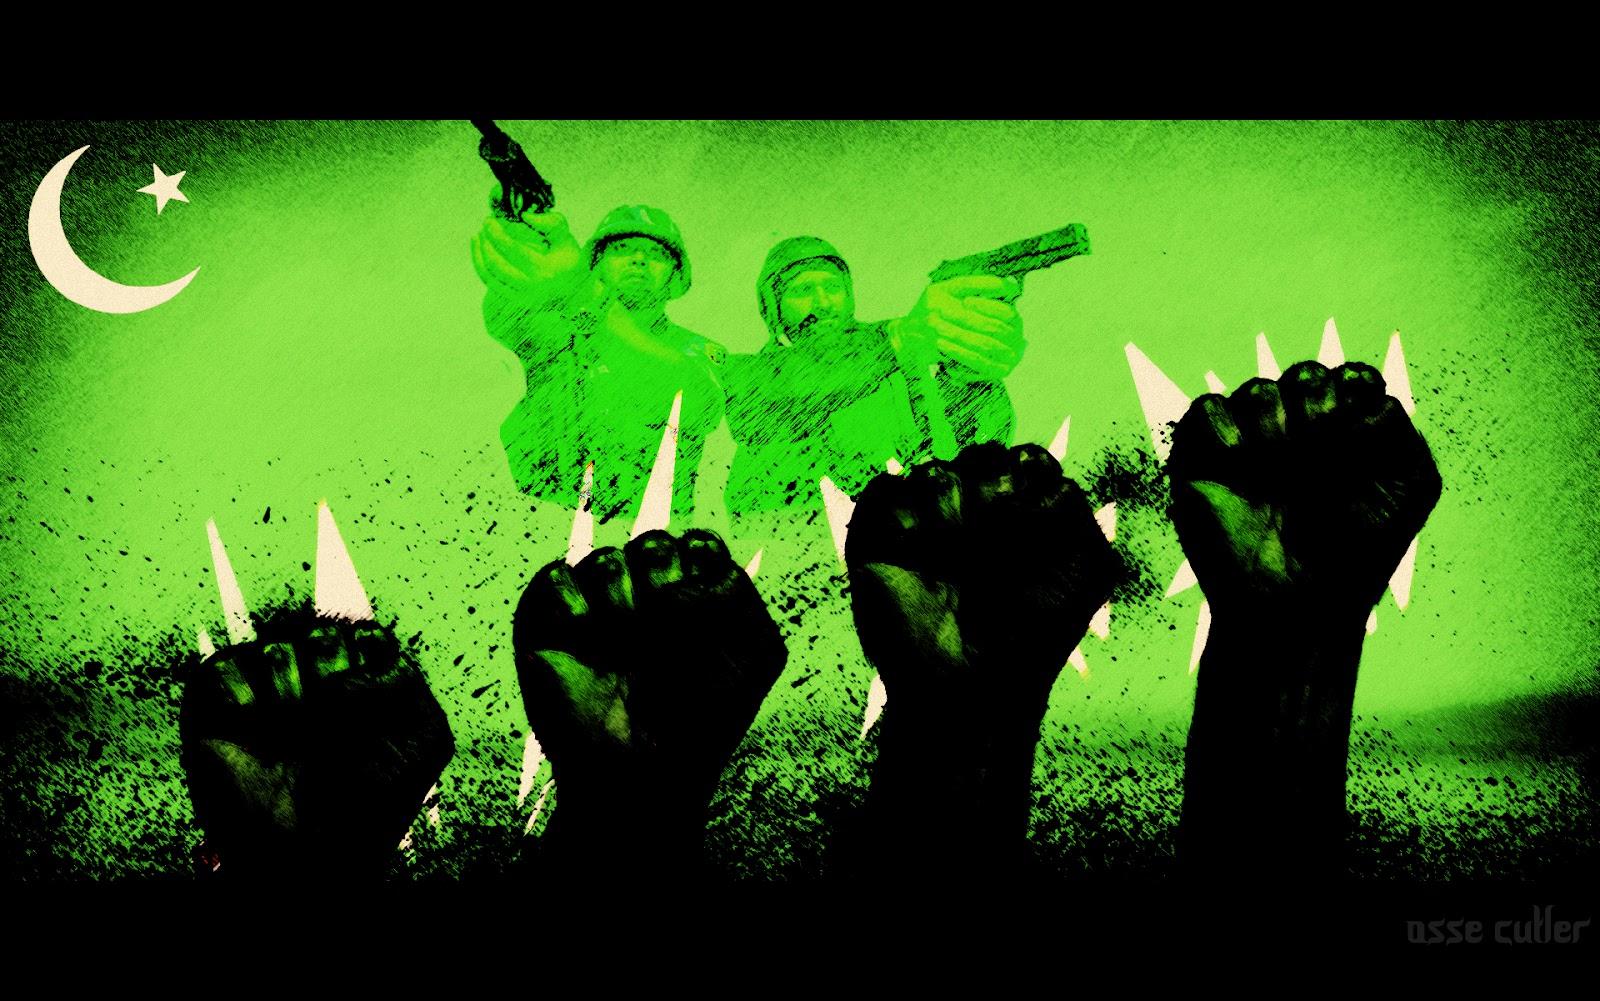 http://4.bp.blogspot.com/-QeZ2jVWJb_4/UB-U8m6freI/AAAAAAAAAS0/zN3VoDhjwrE/s1600/pakistan+independence+day.jpg